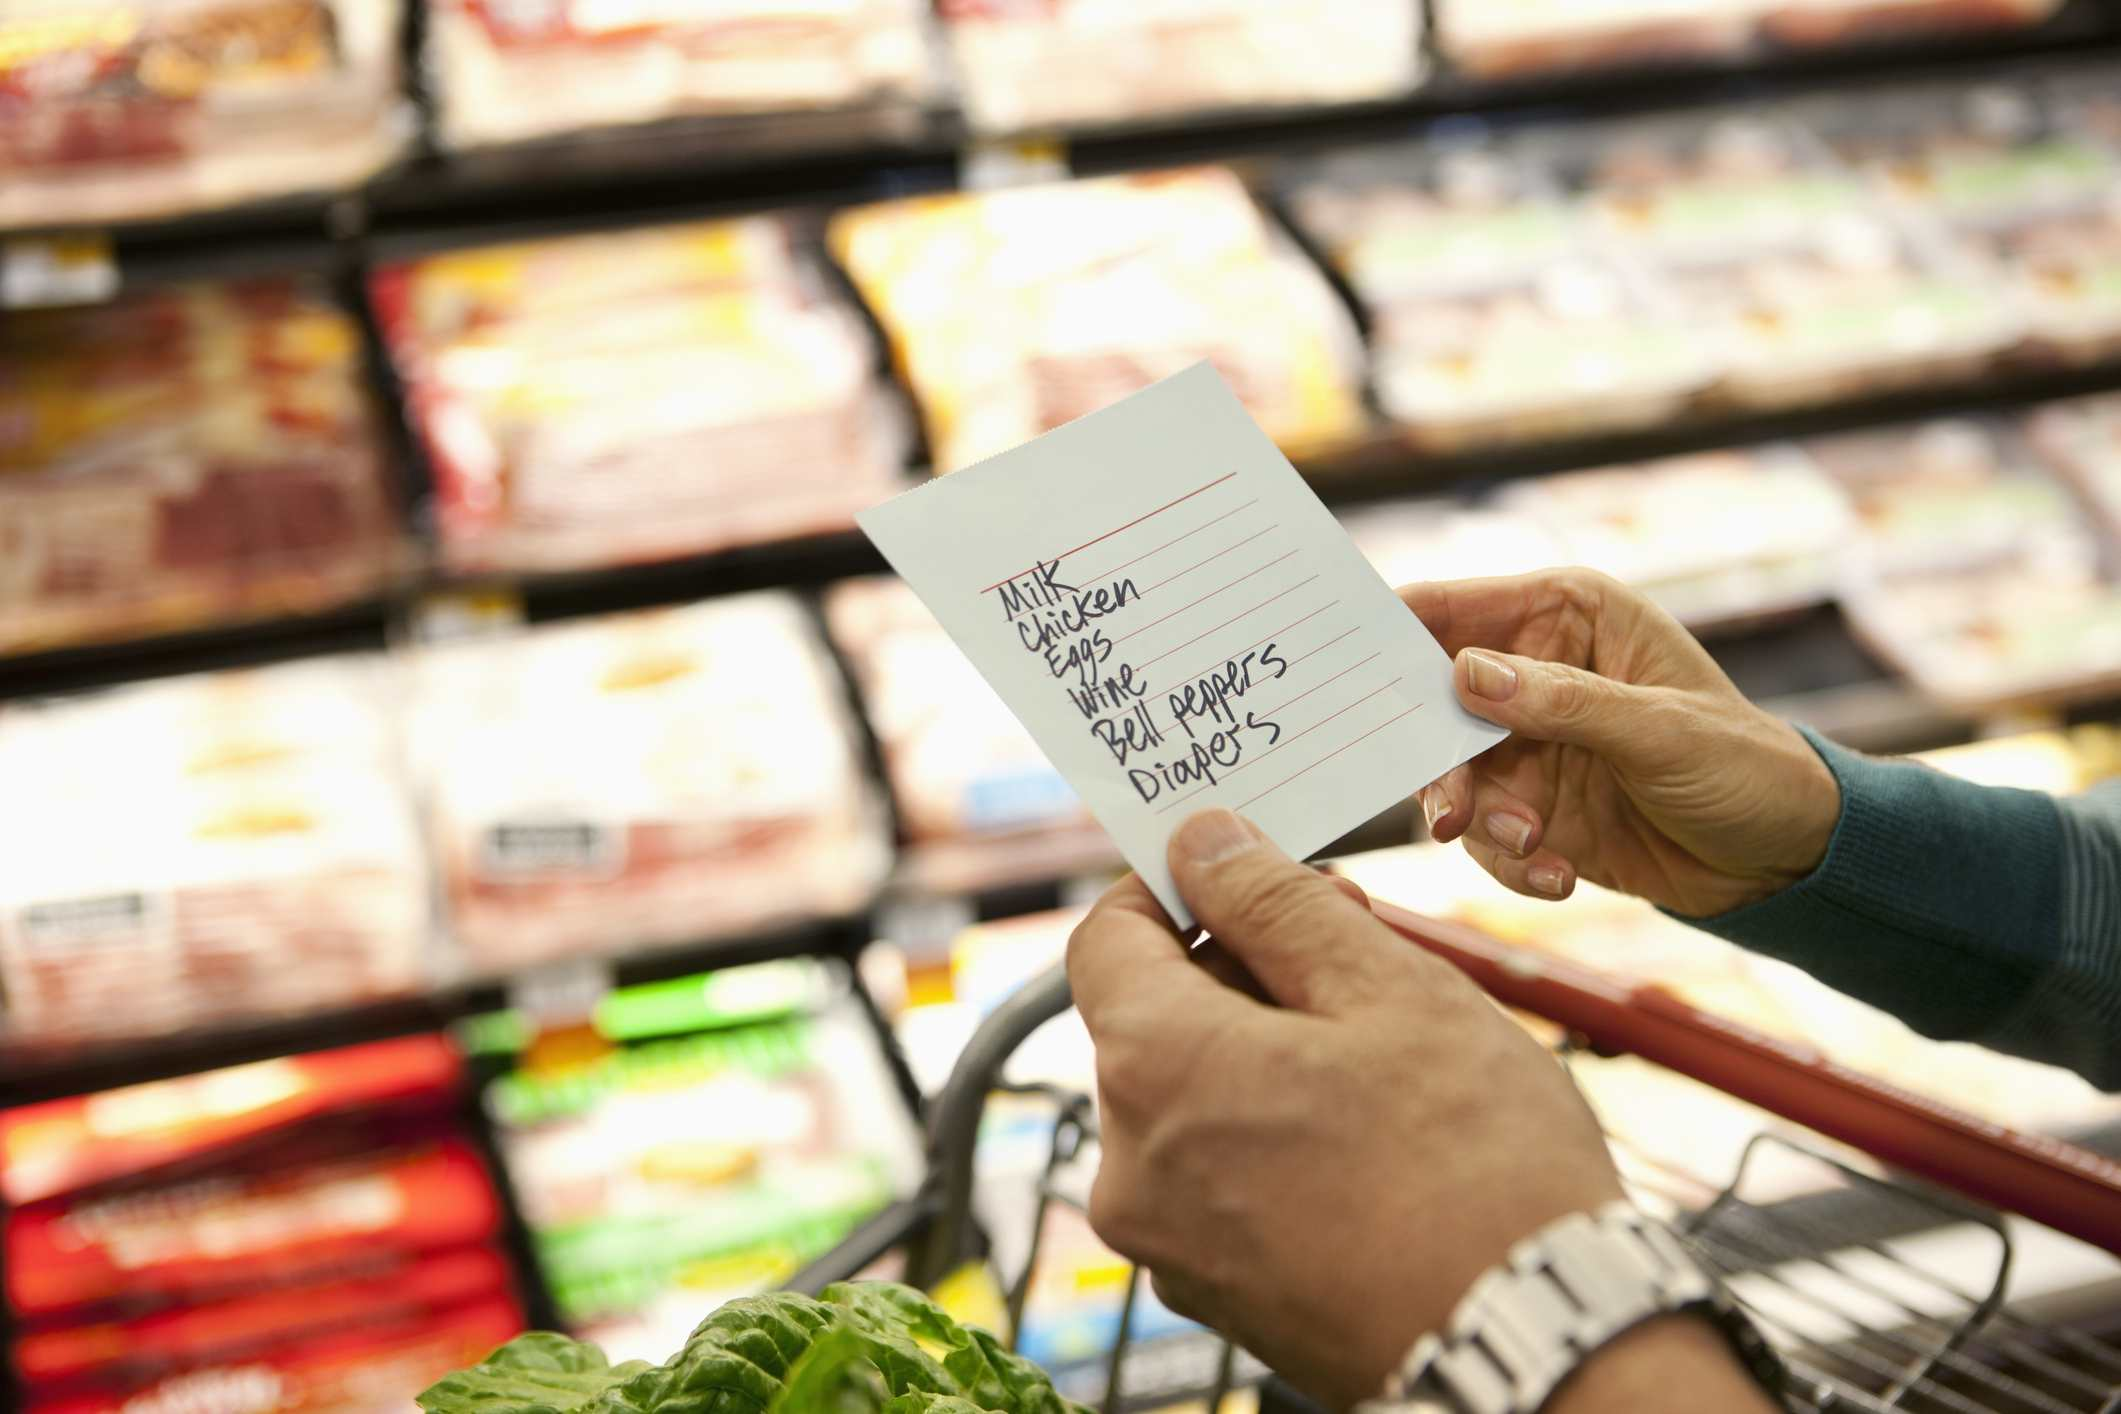 Older woman reading grocery list in supermarket